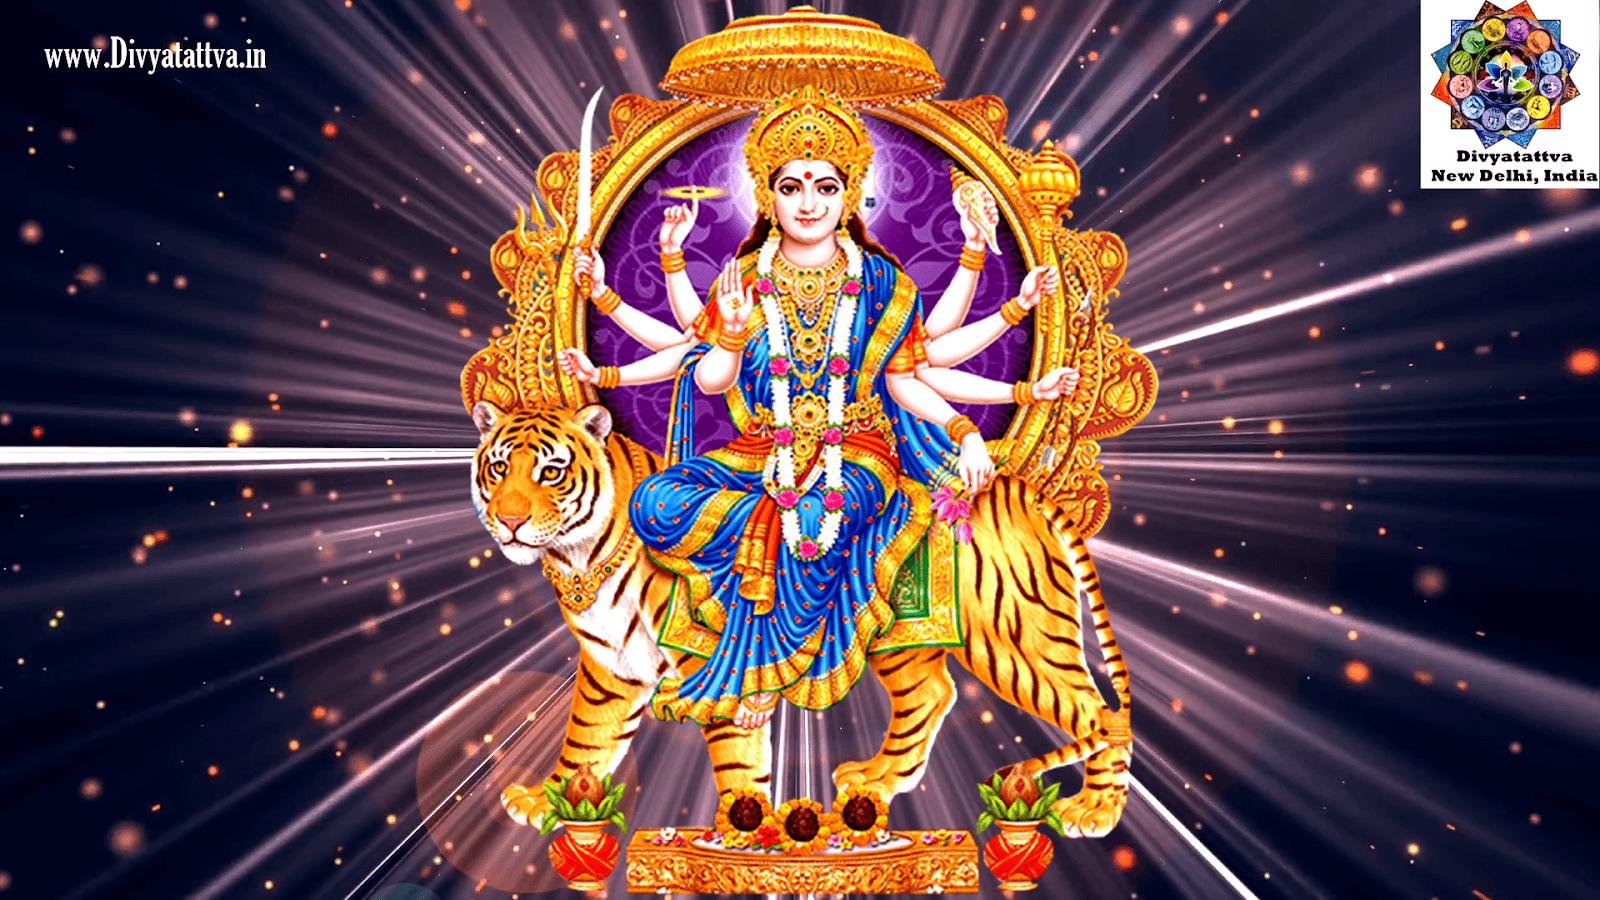 Maa Durga Desktop Full Hd Wallpapers Wallpaper Cave